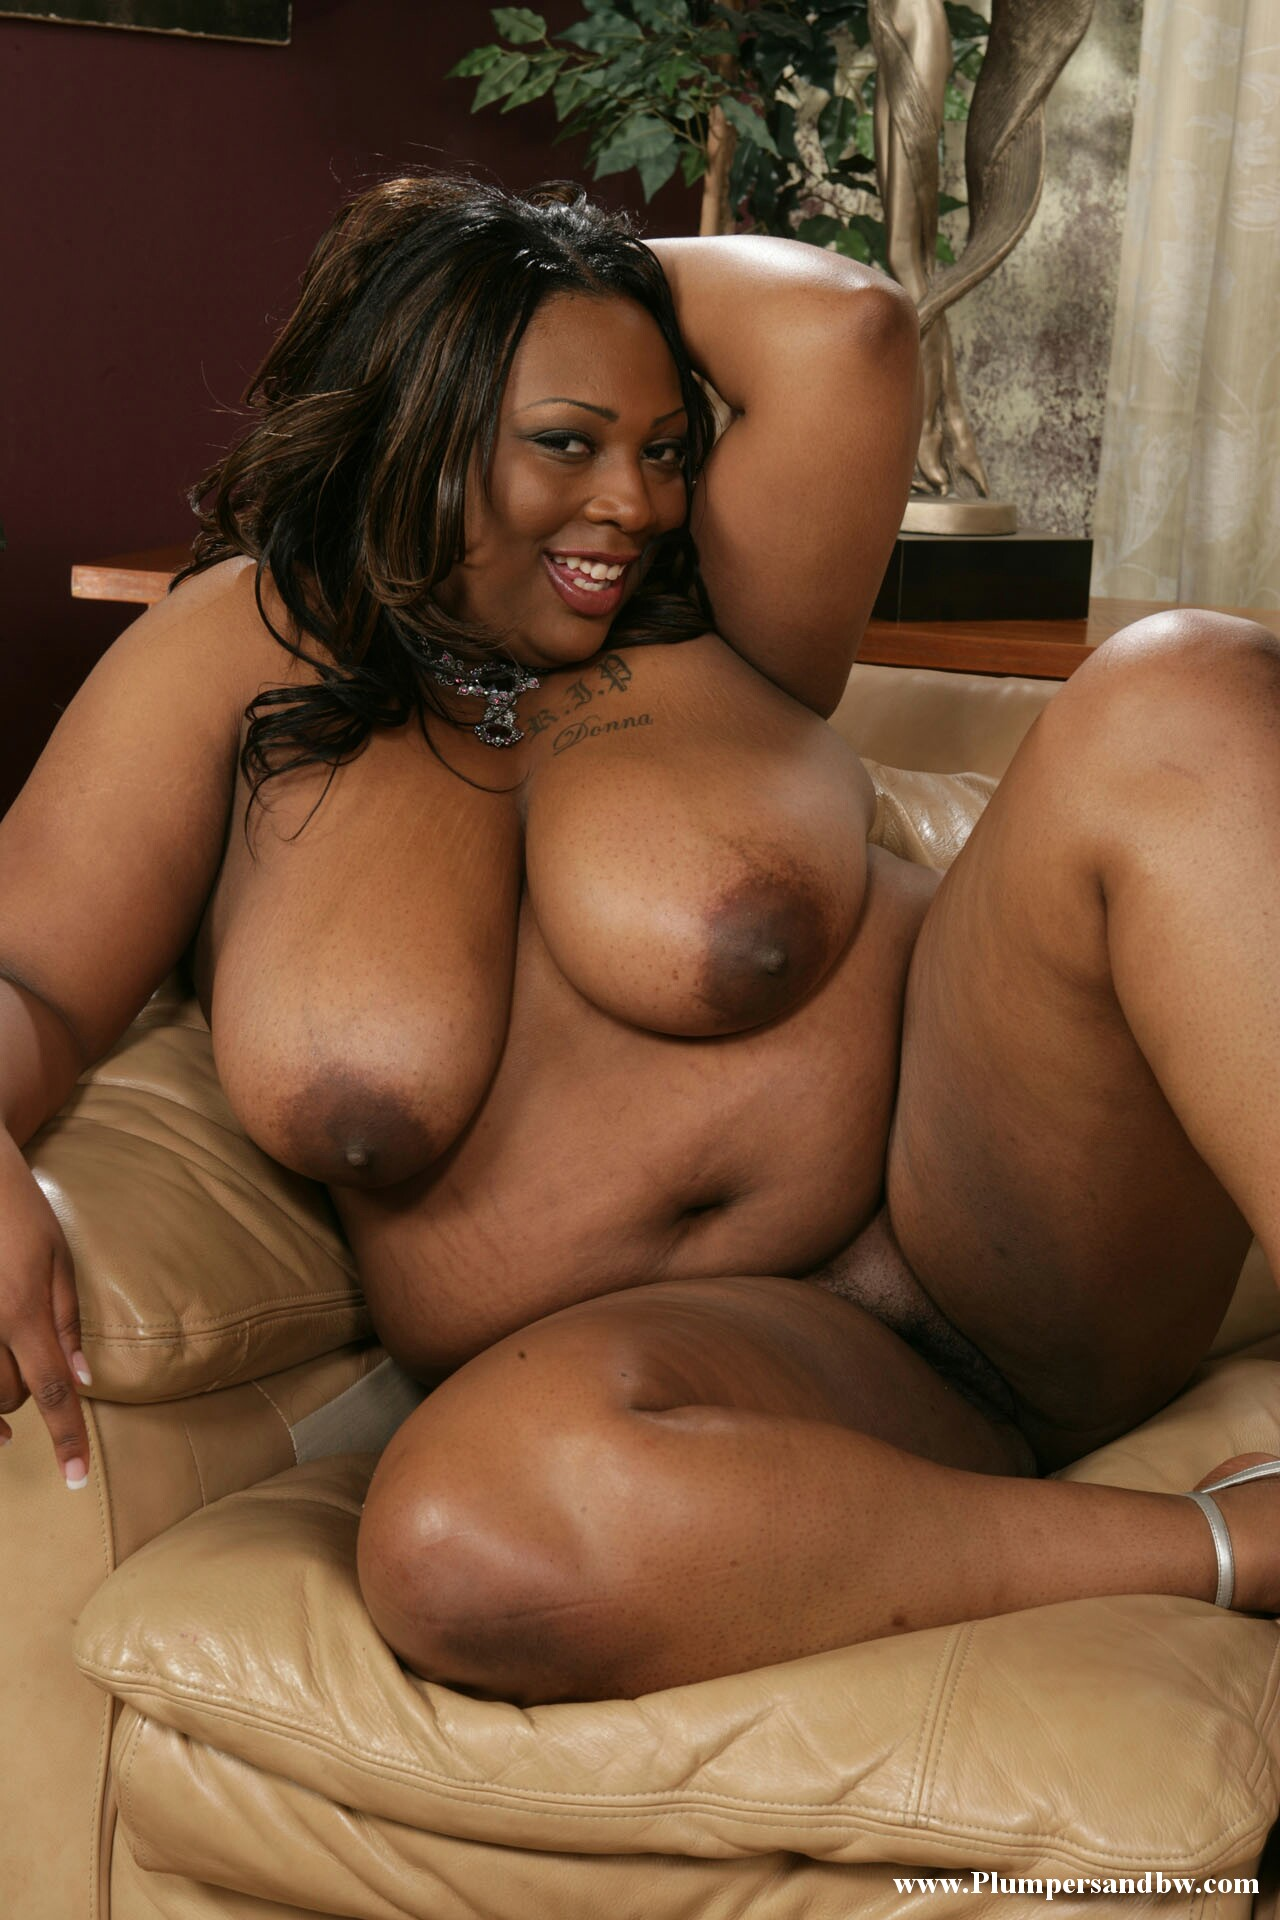 Amateur Teeny nude